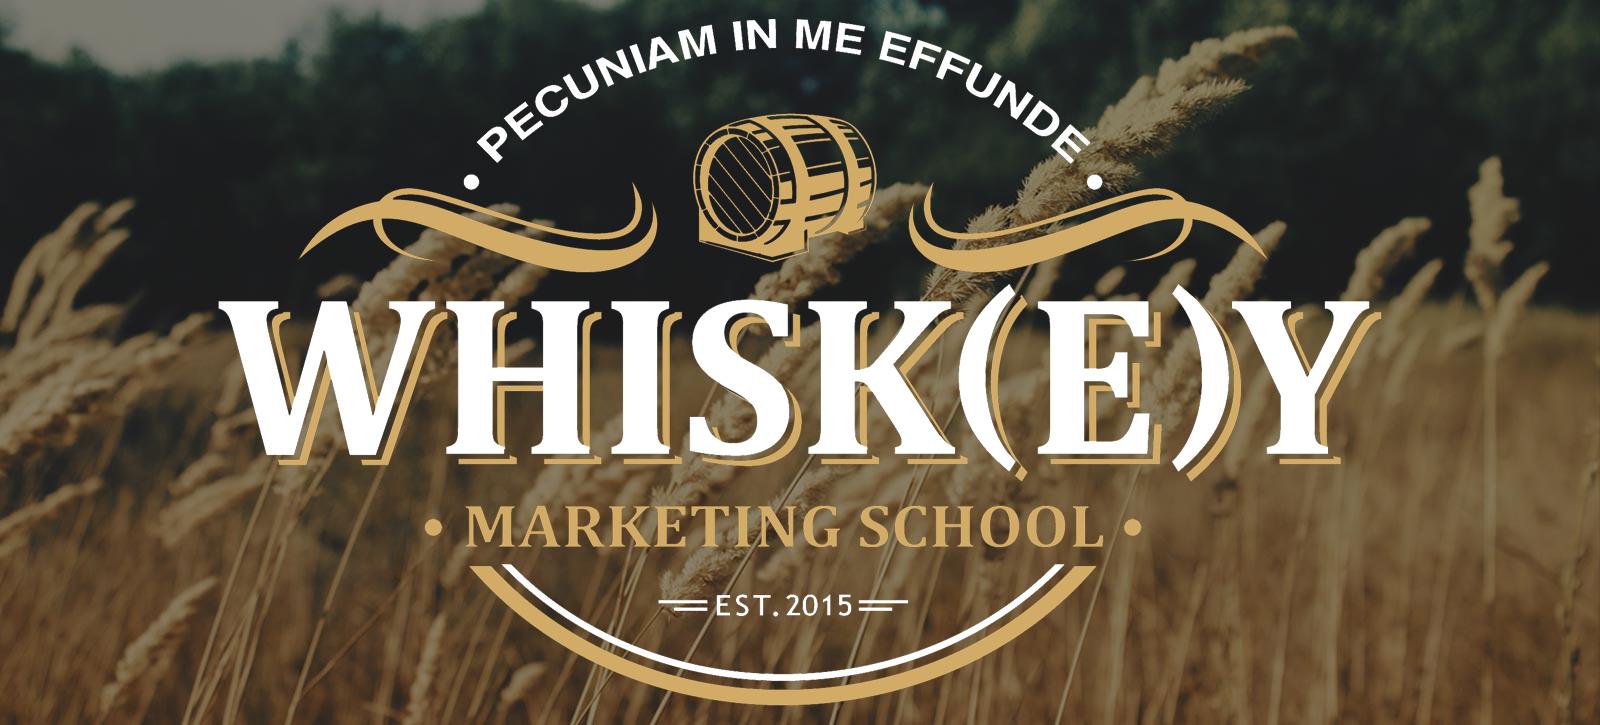 Whisky Marketing Wheat Header with Logo